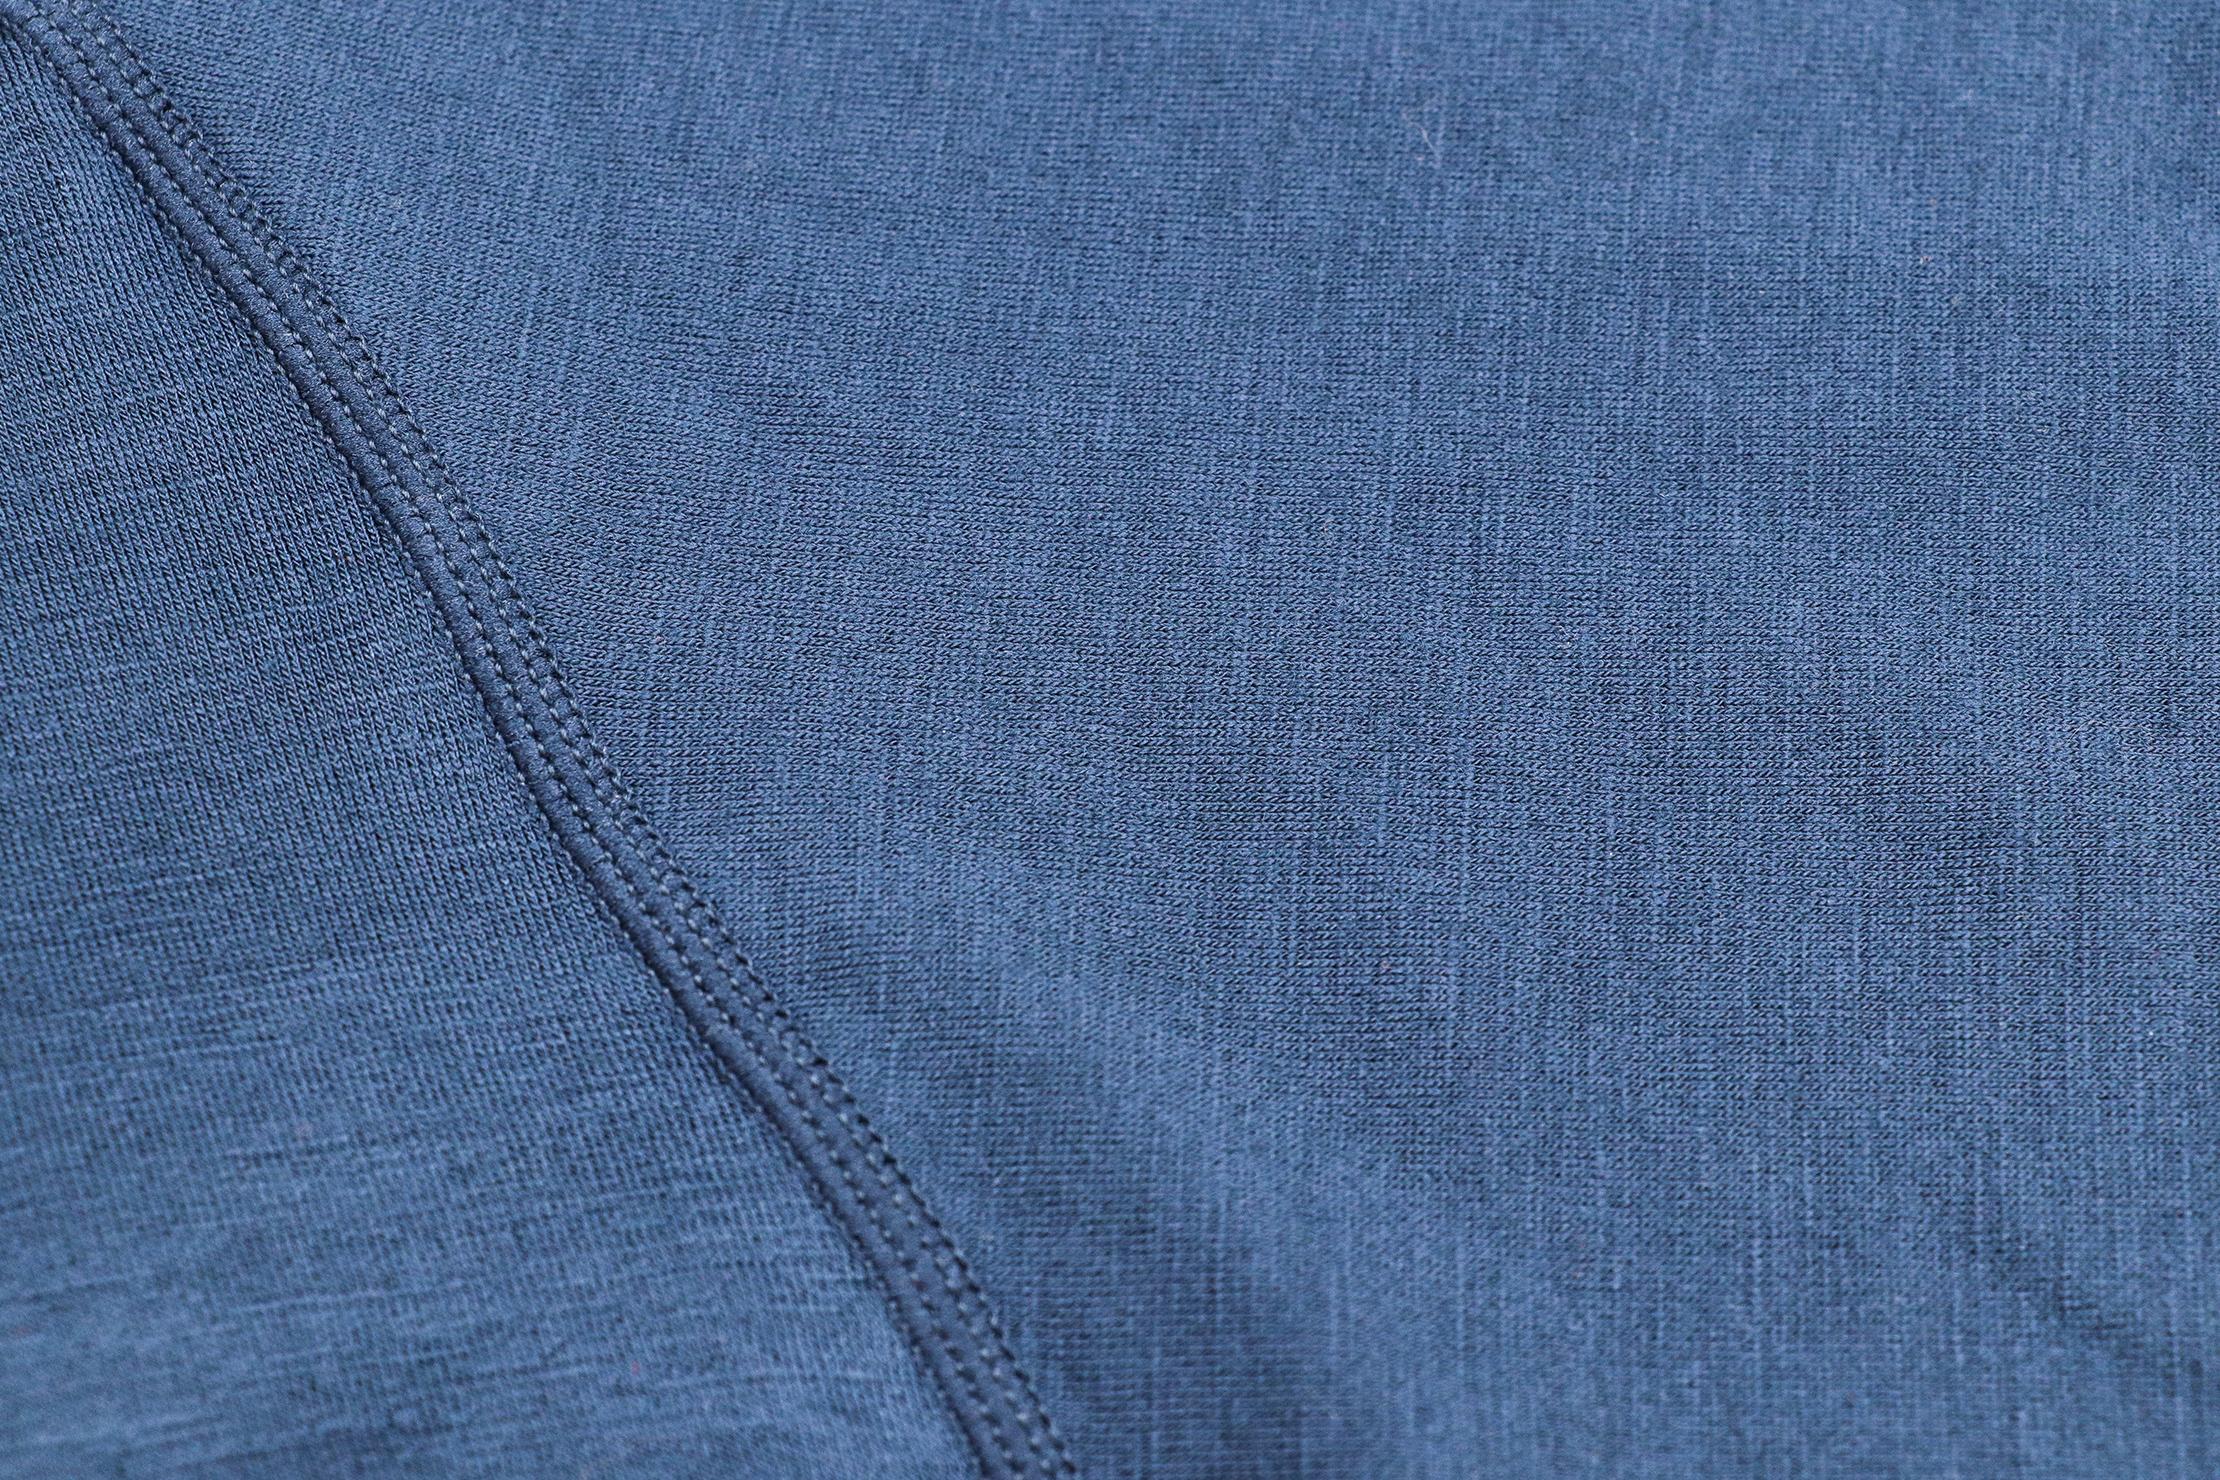 Wool & Prince Boxers 2.0 Fabric